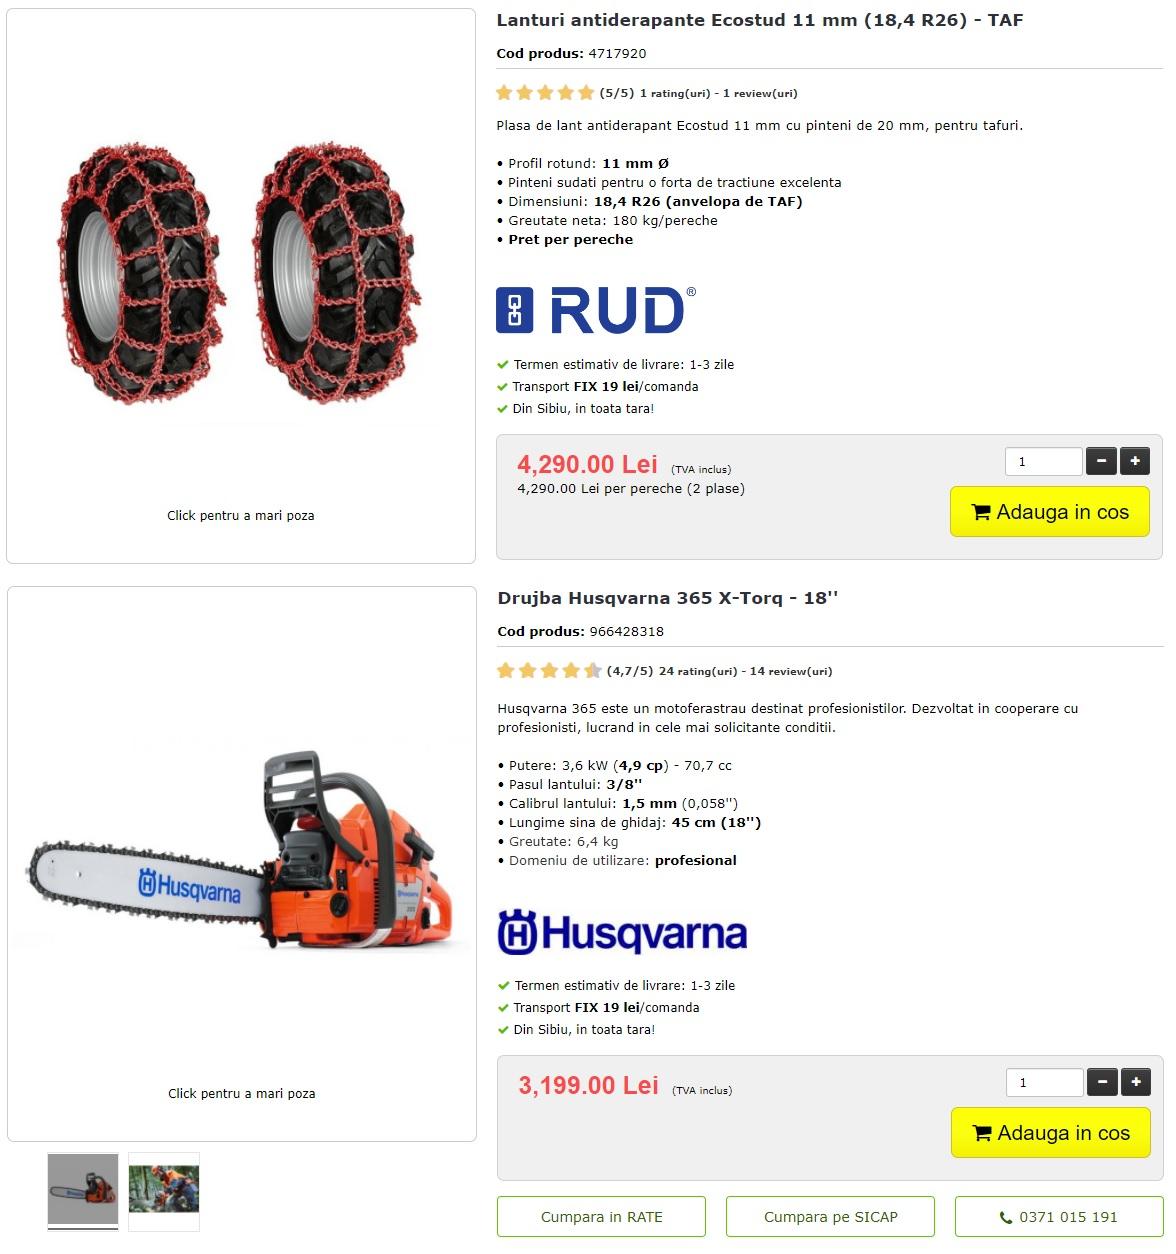 Pachet promotional Husqvarna 365 + Lanturi Ecostud TAF 18,4 R26